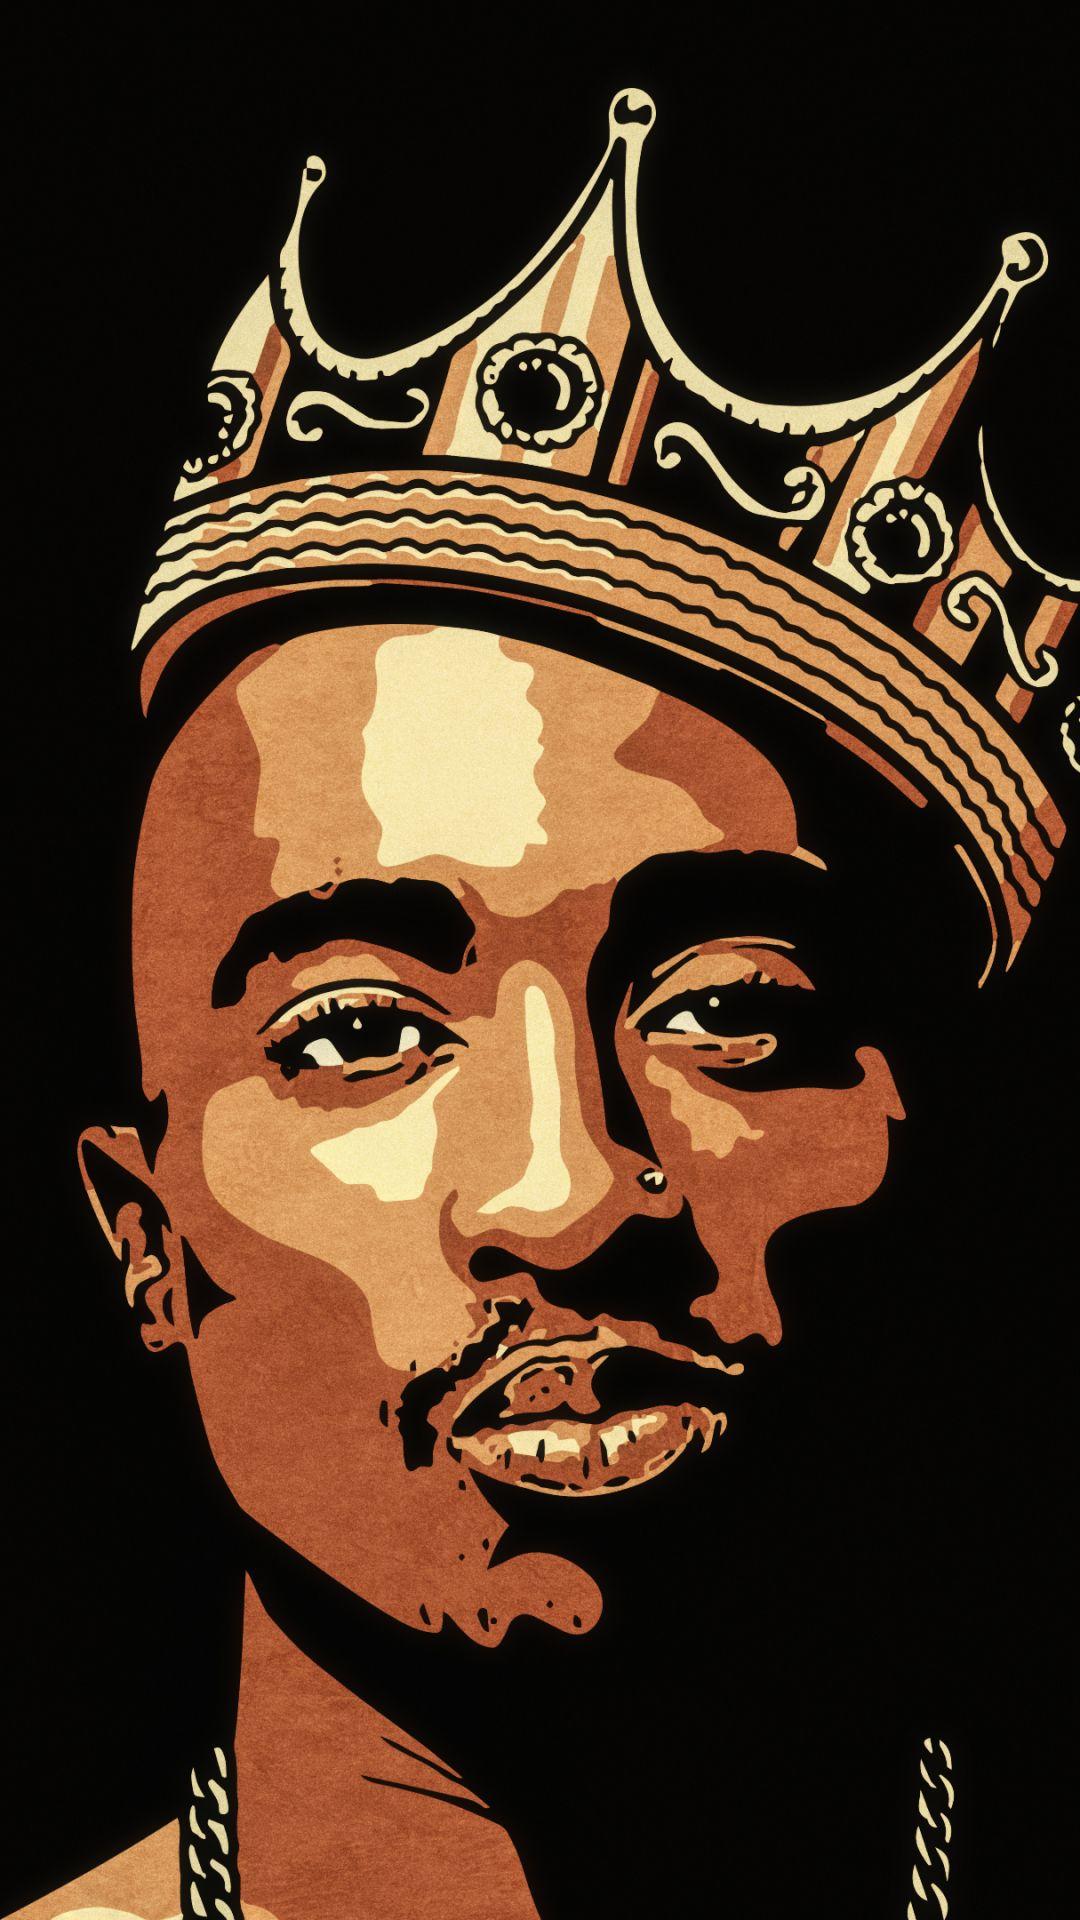 Lbcloomis Wallpaper Hd New Wallpaper Cartoon Wallpaper Tupac Shakur In 2020 Rapper Art Tupac Art 2pac Art